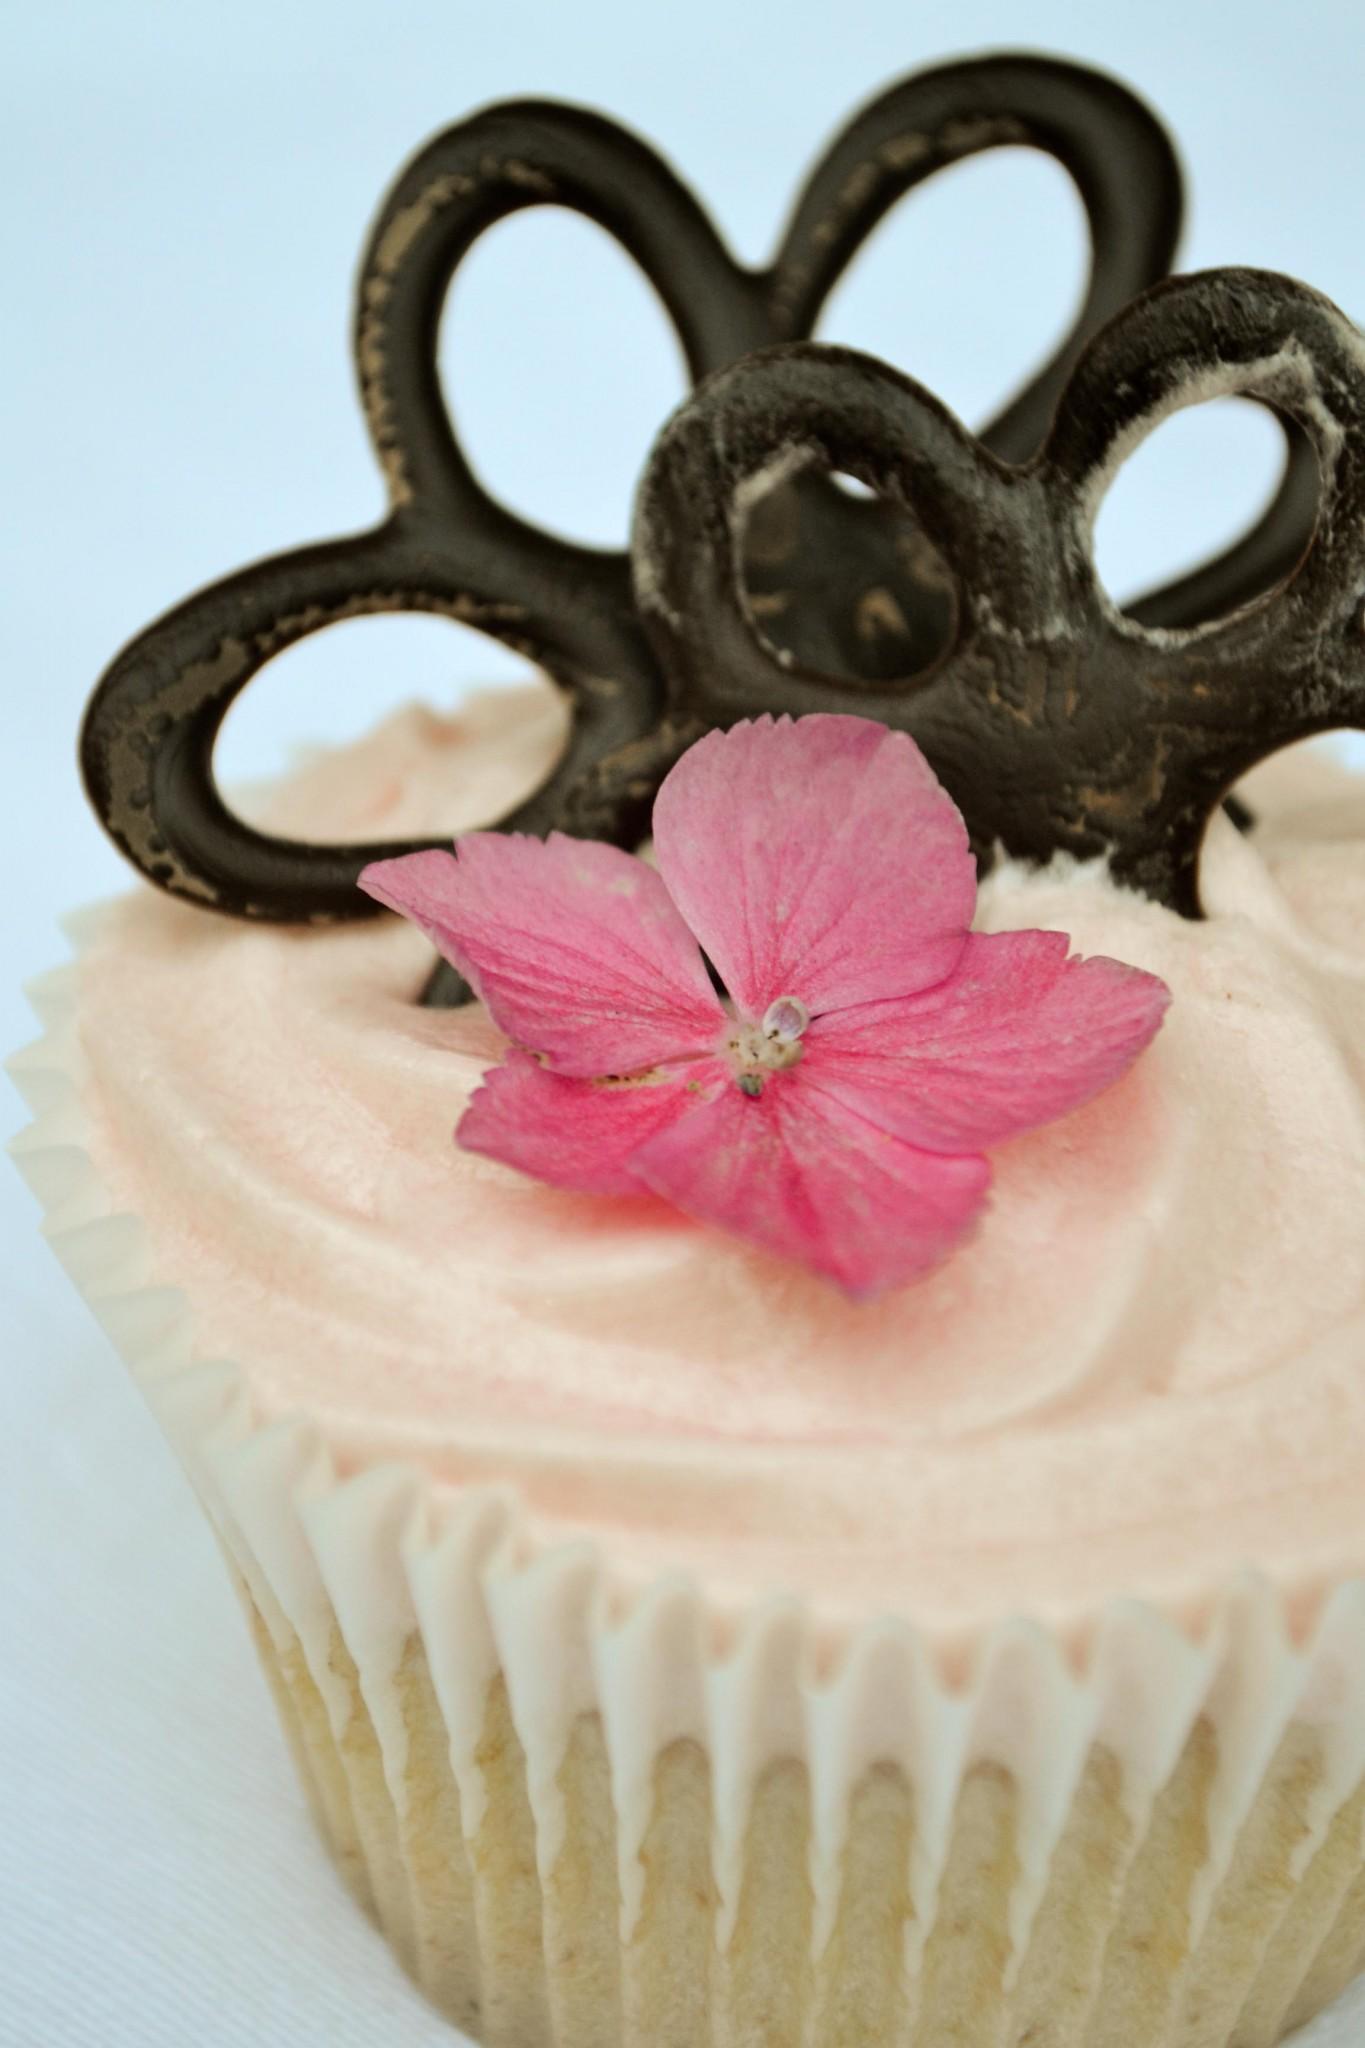 cupcake, sakura, hanami, cherry blossom